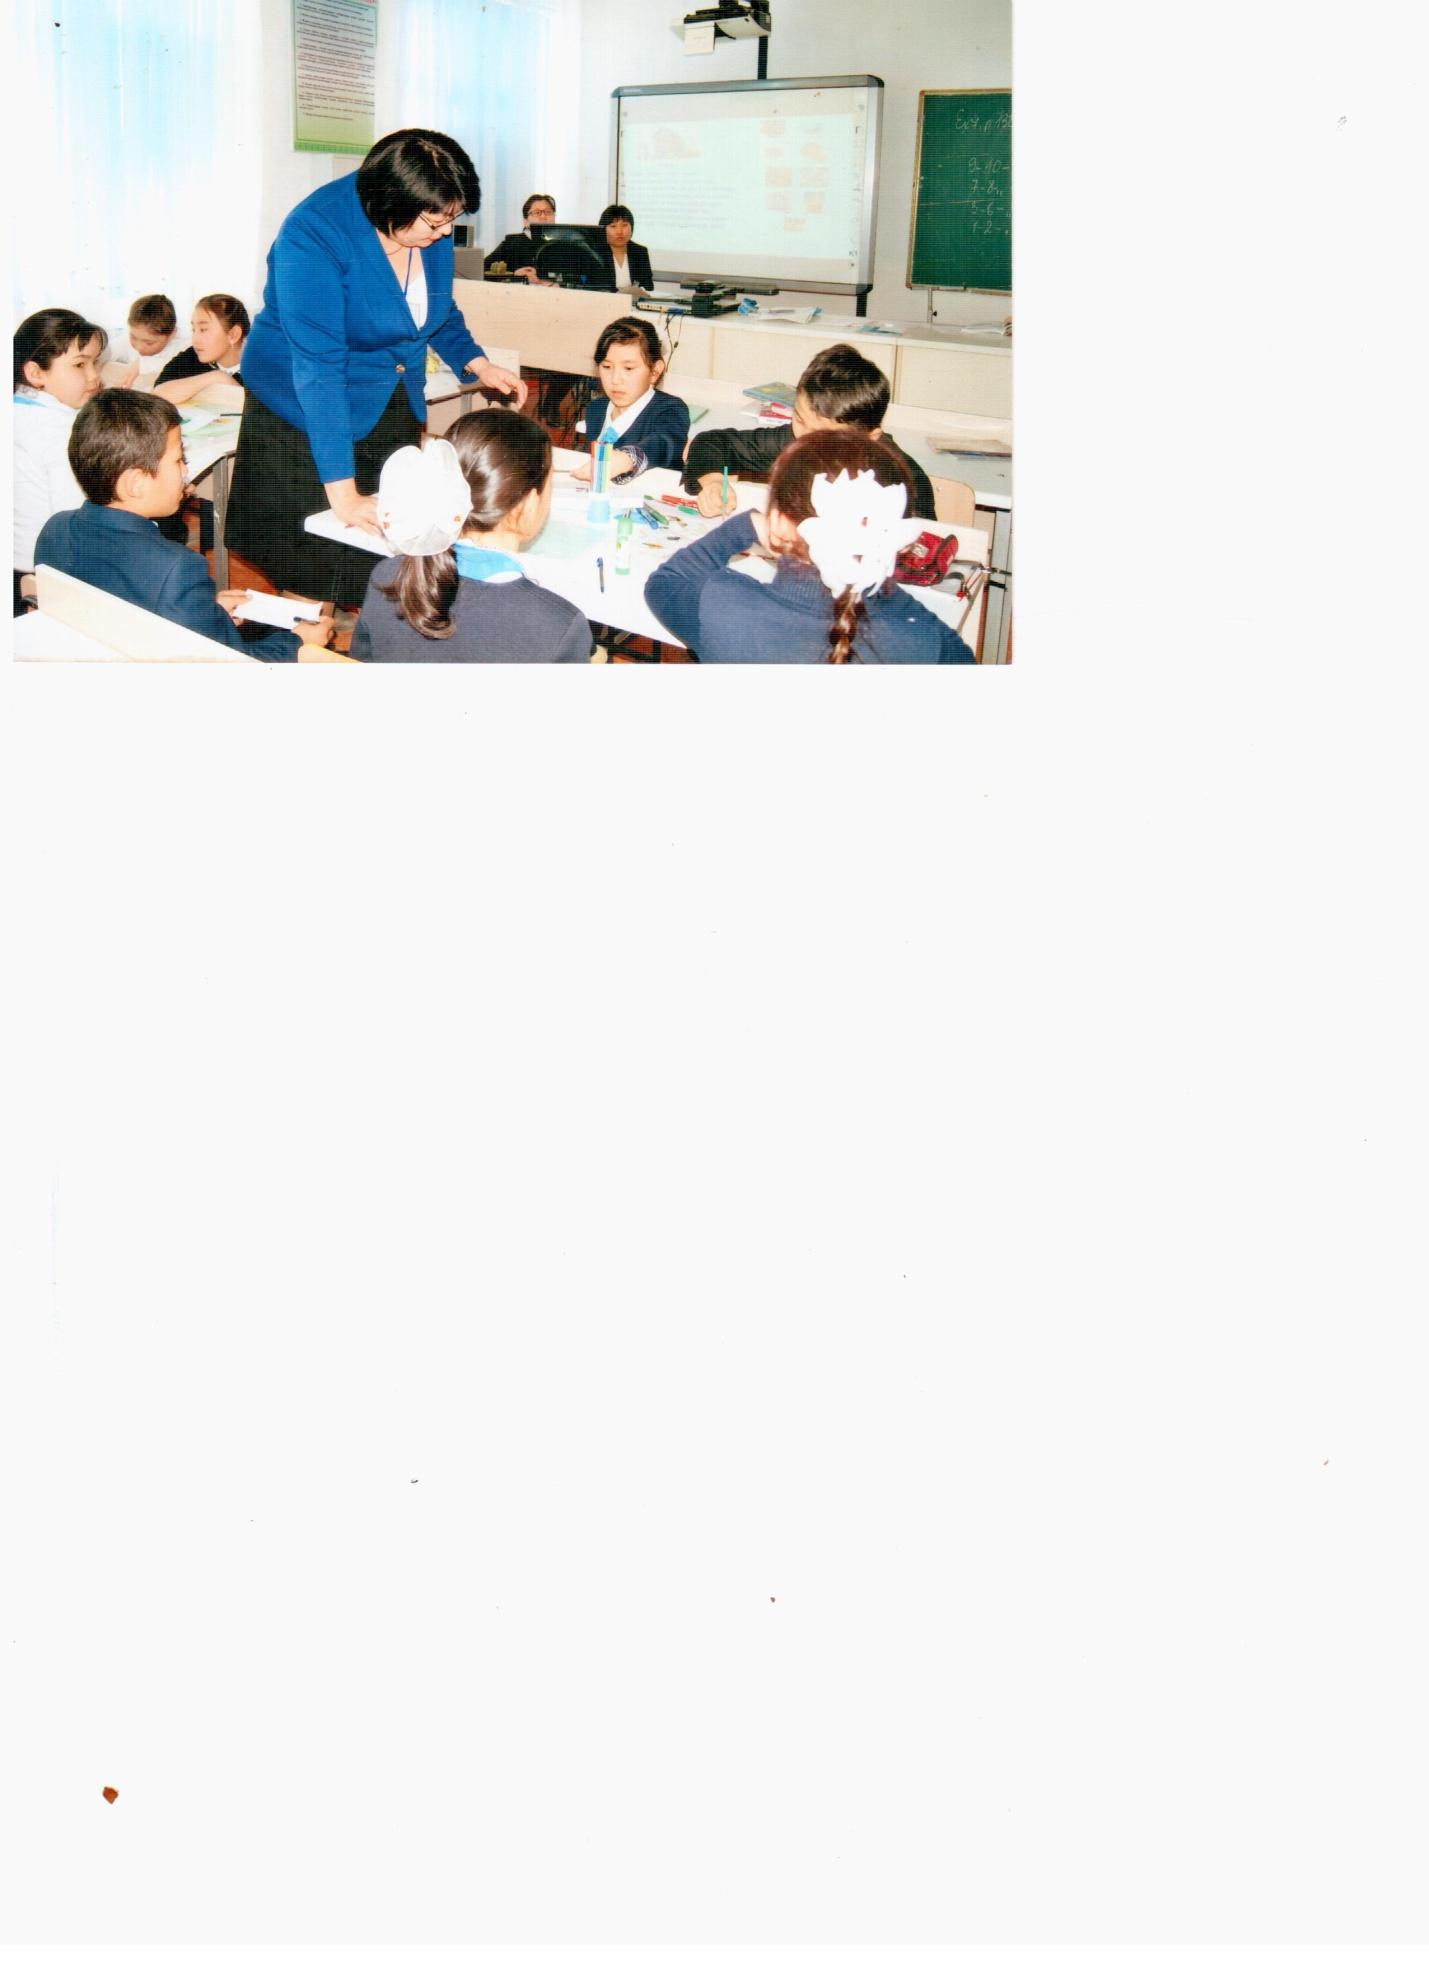 C:\Users\DOC\Pictures\2015-11-22 фото3 урок\фото3 урок 001.jpg